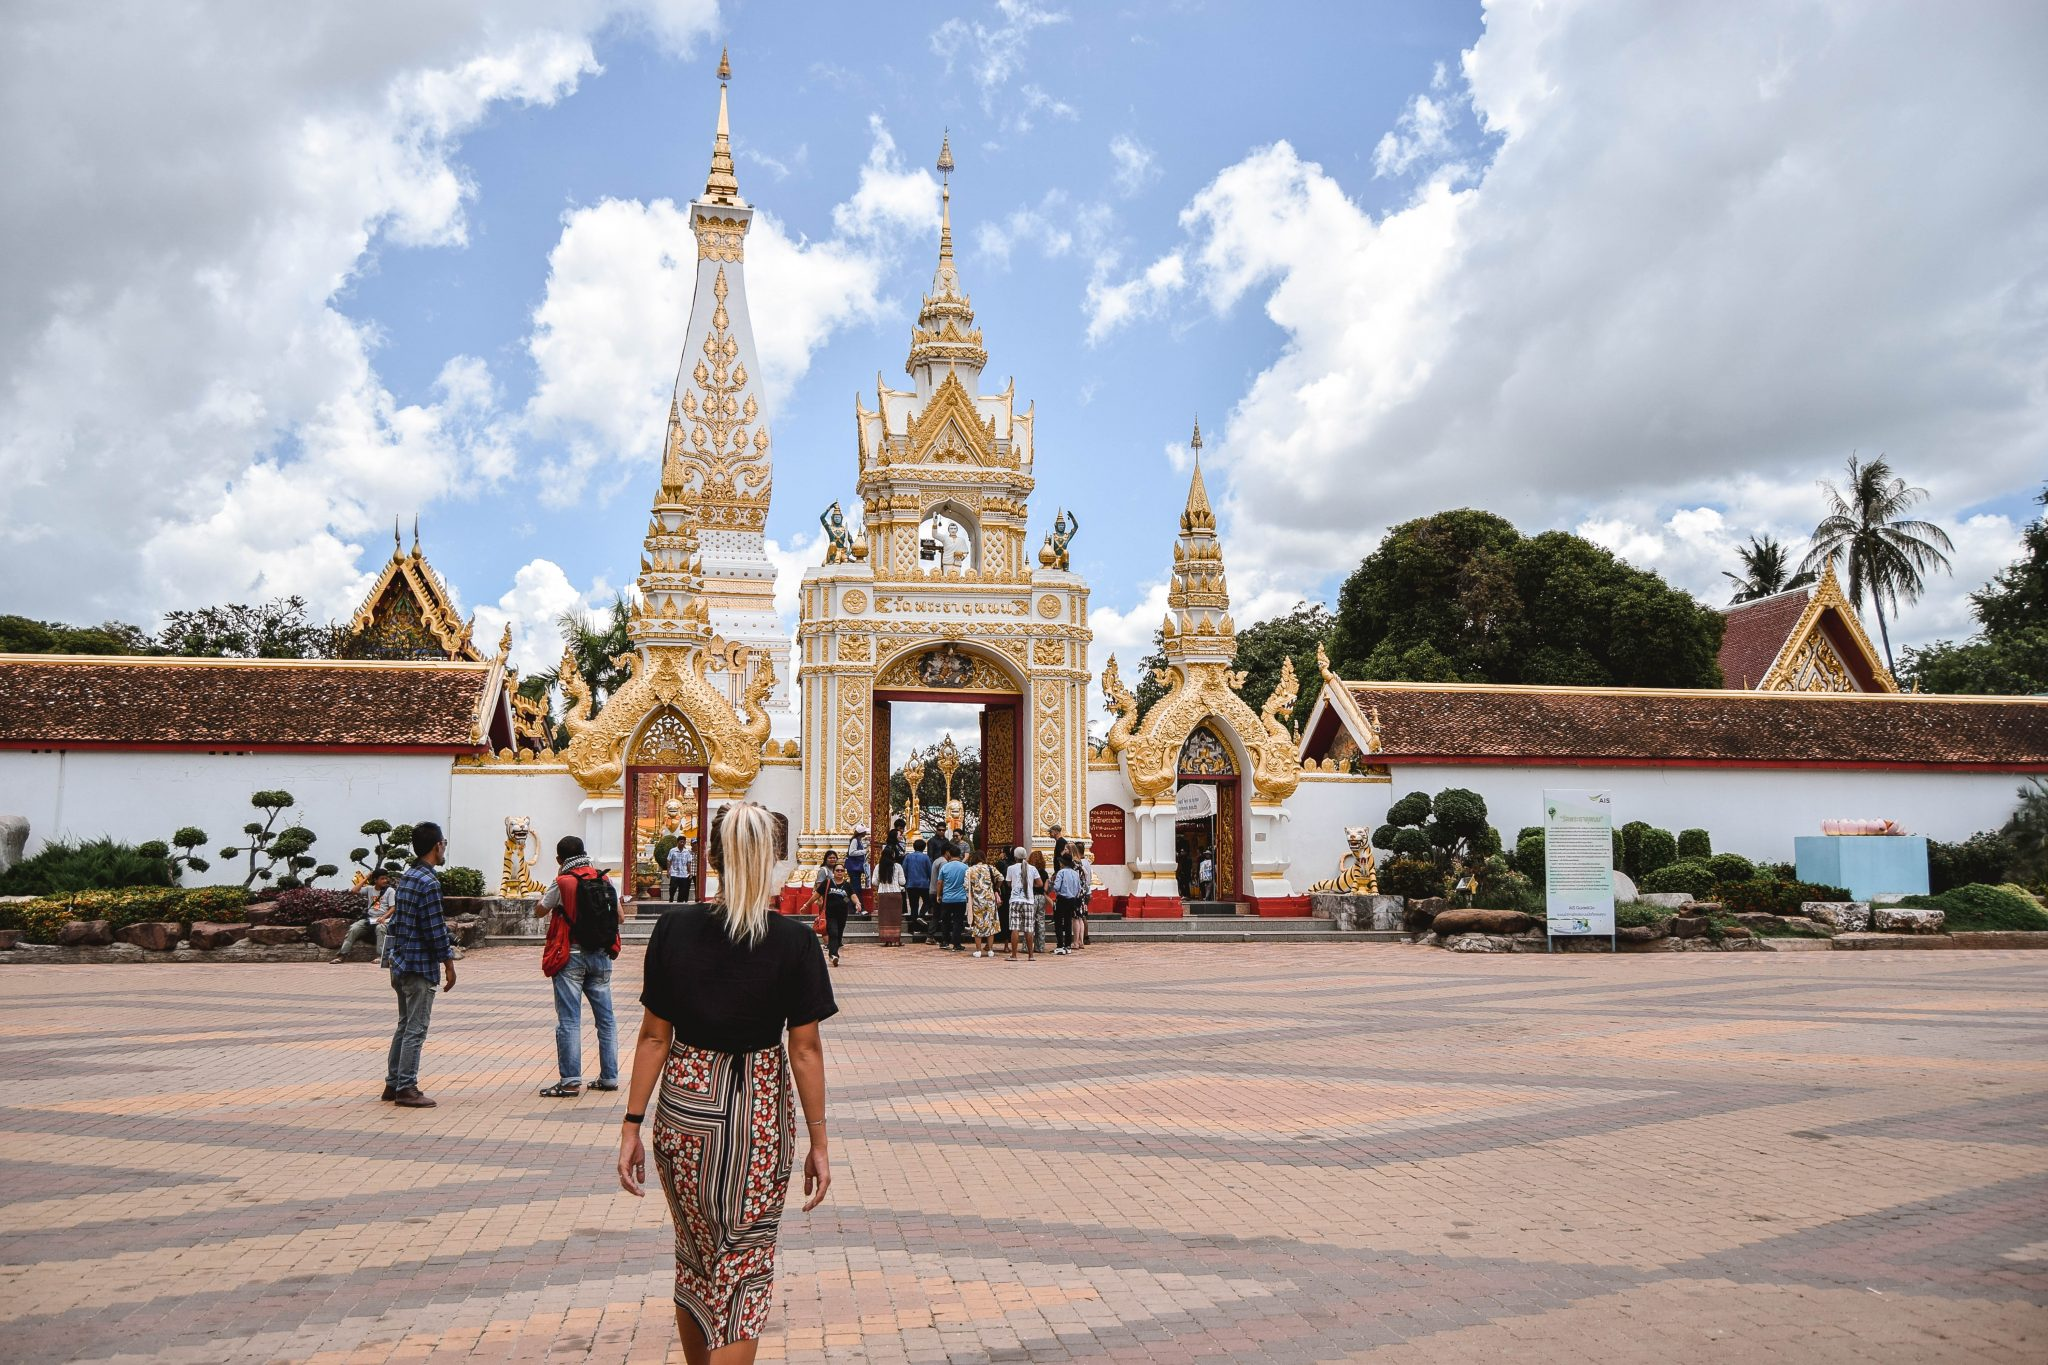 Wanderers & Warriors - Charlie & Lauren UK Travel Couple - 7 Things To Do In Nakhon Phanom - Wat Phra That Phanom